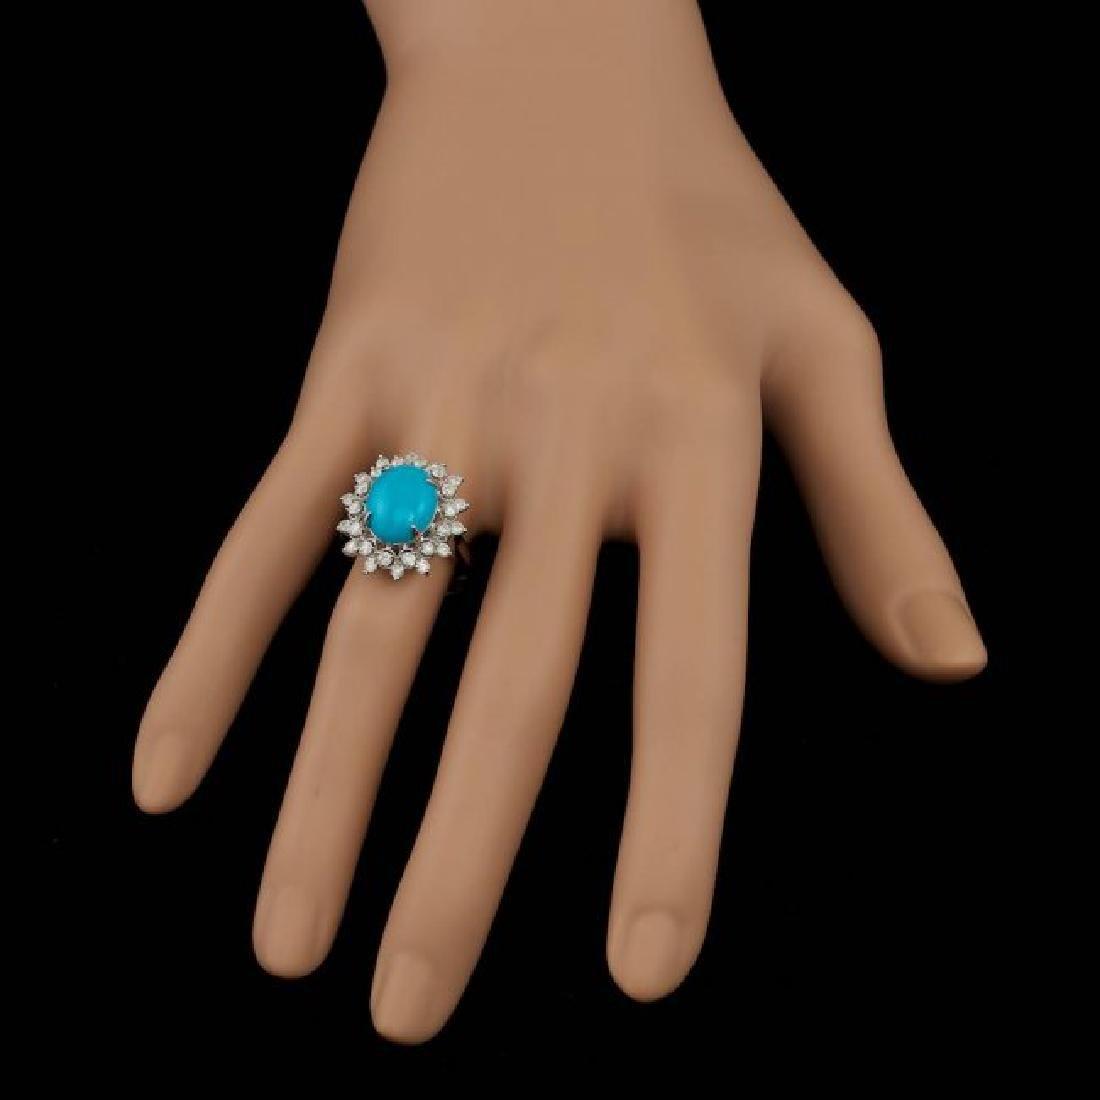 14k Gold 3.30ct Turquoise 0.75ct Diamond Ring - 6